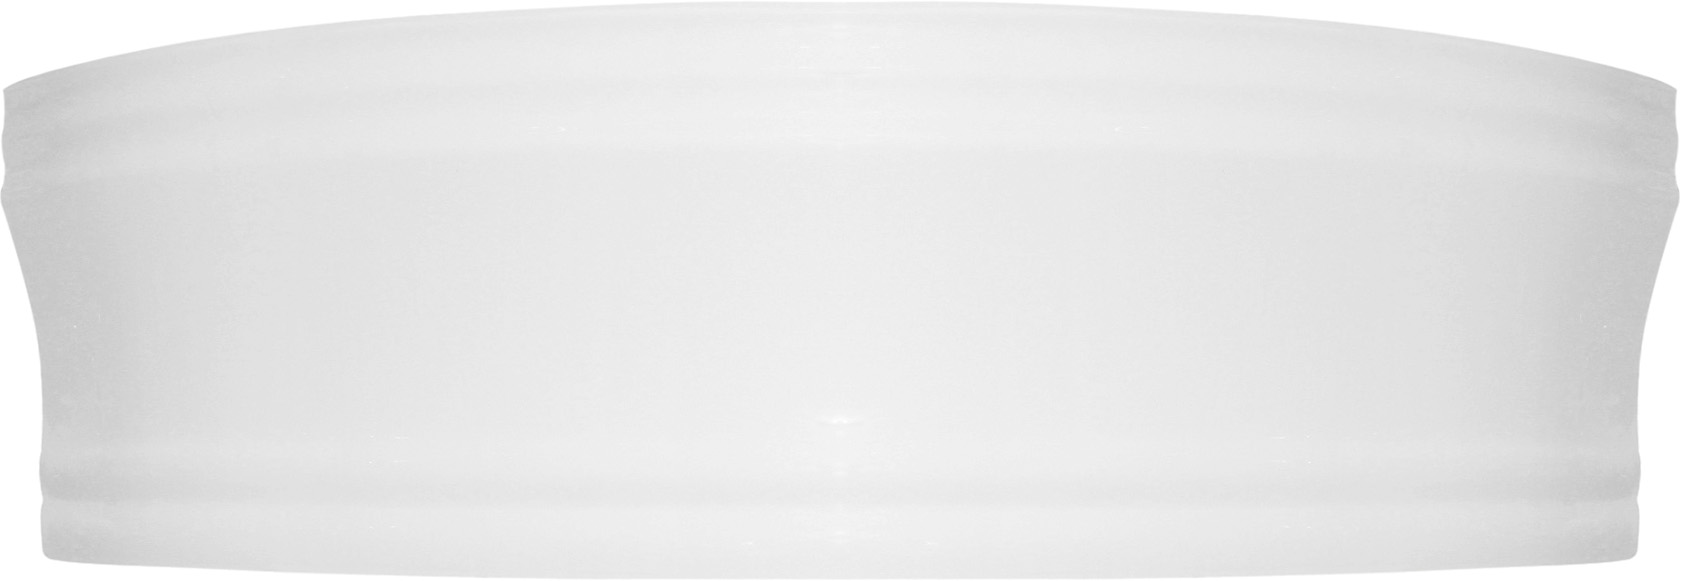 Панель для ванны Cersanit Venus 150 S401-013